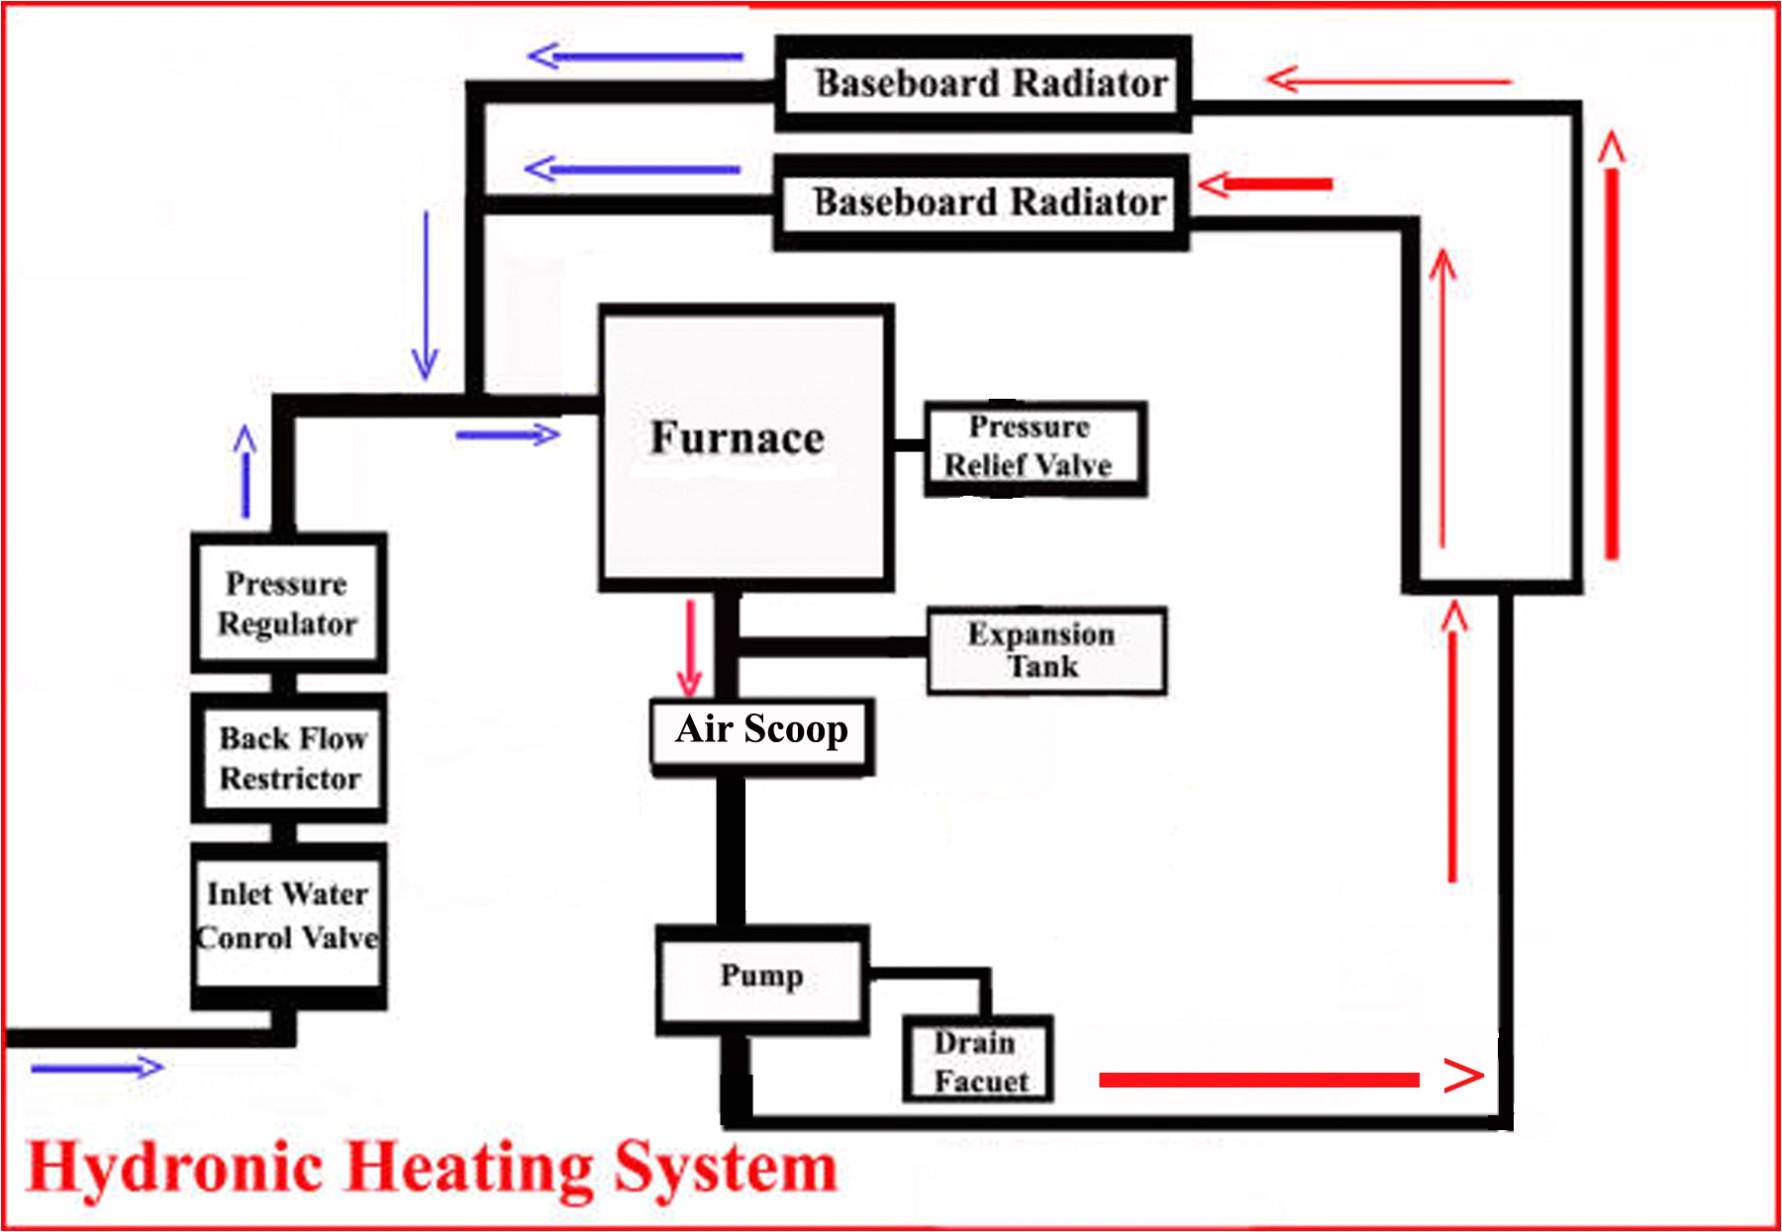 hot water heater diagram electric hot water tank wiring diagram rheemater ge whirlpool heater